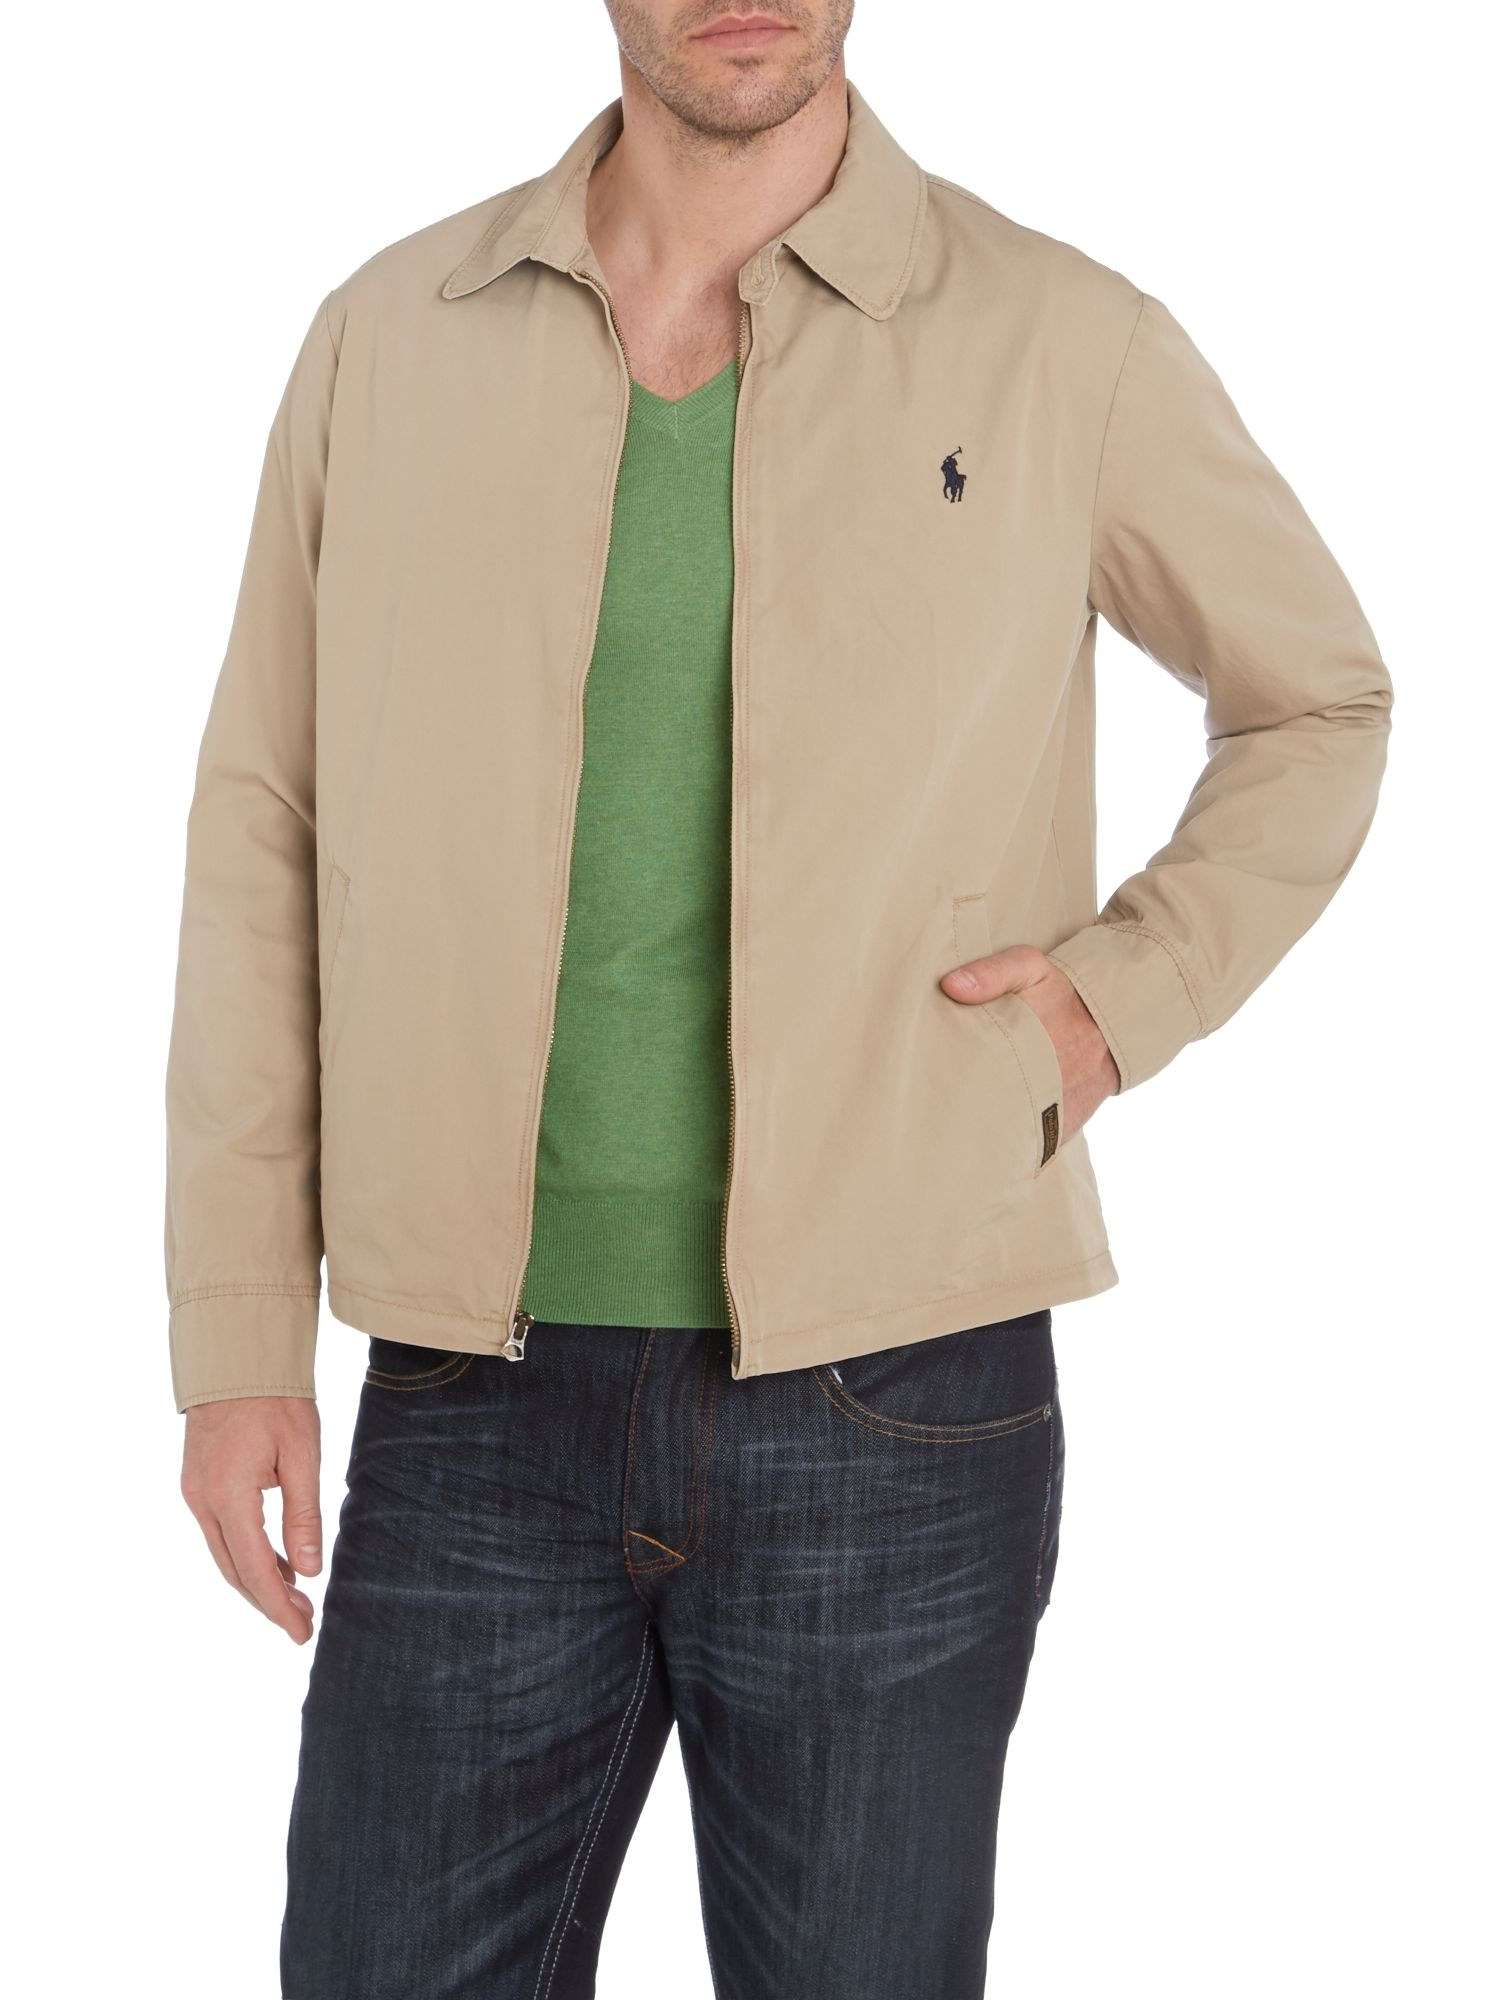 polo ralph lauren classic landon windbreaker jacket in. Black Bedroom Furniture Sets. Home Design Ideas